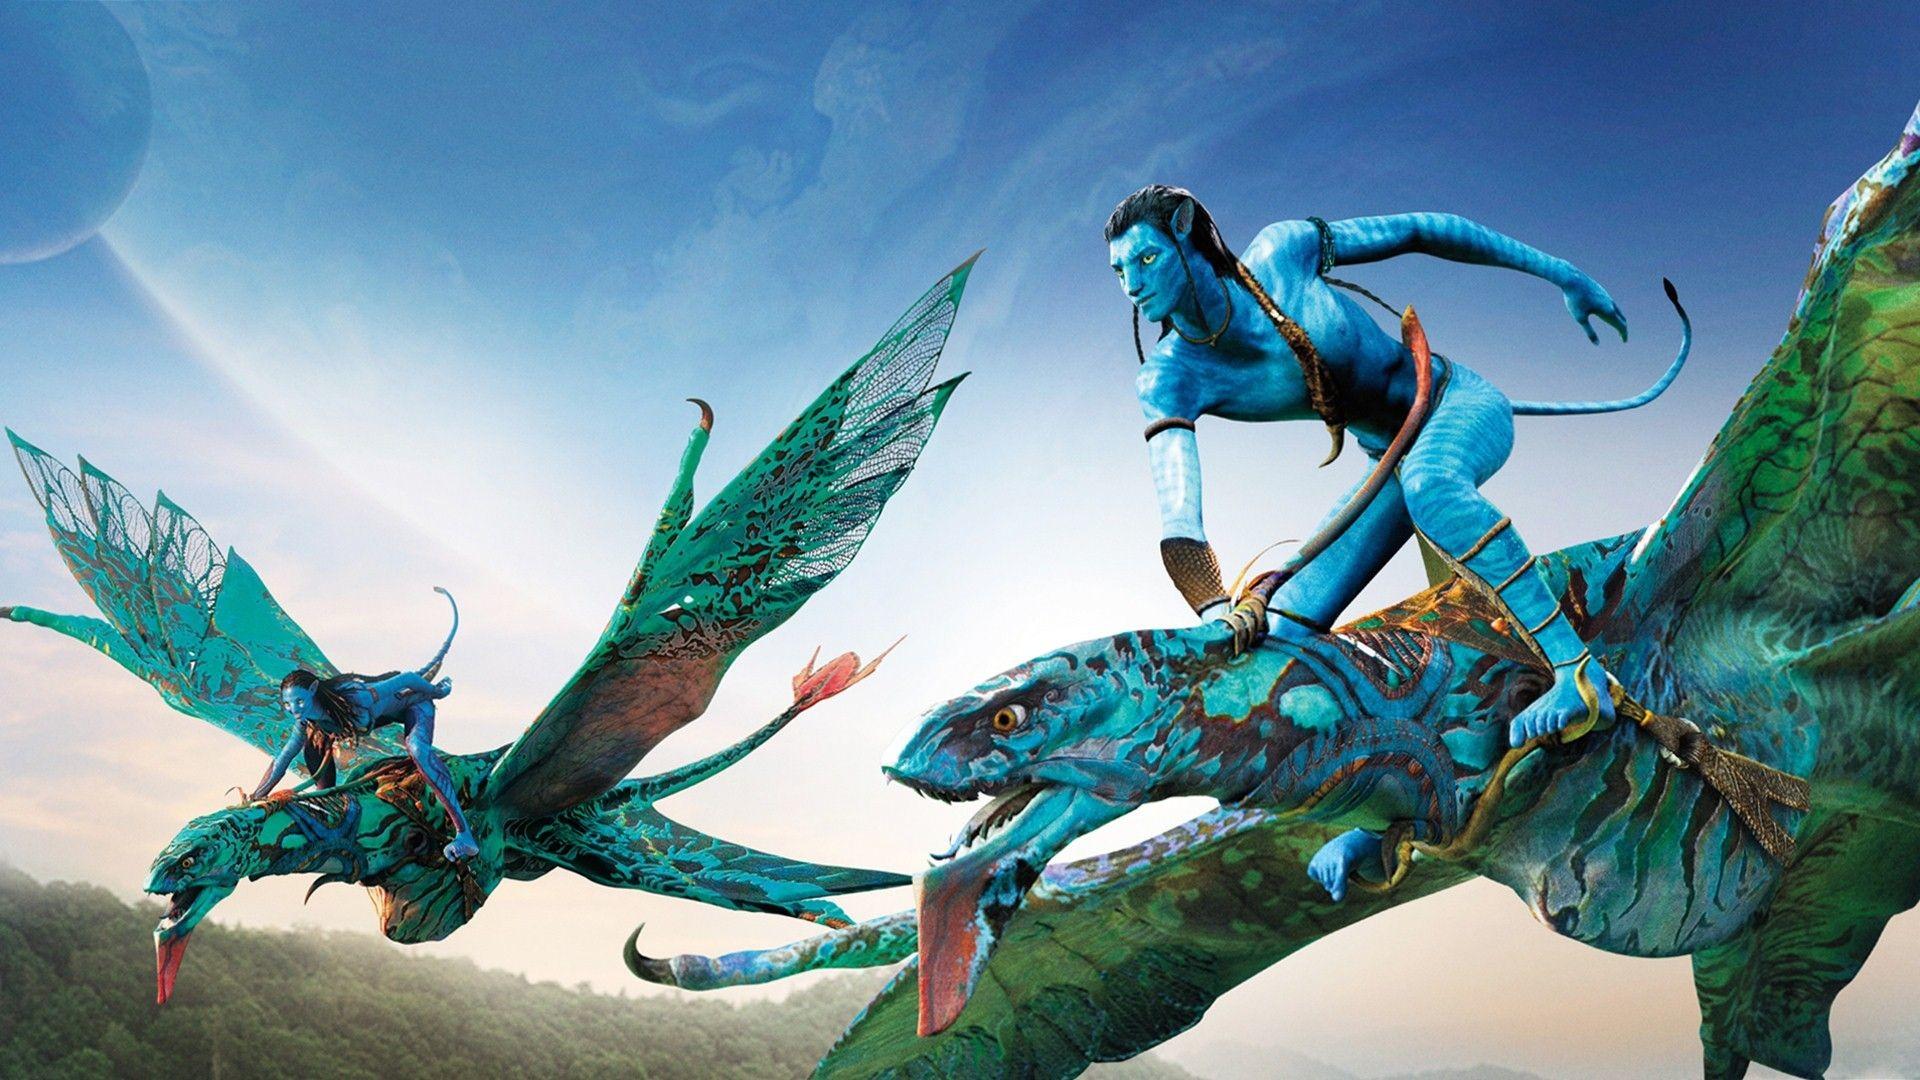 Image Avatar Movie